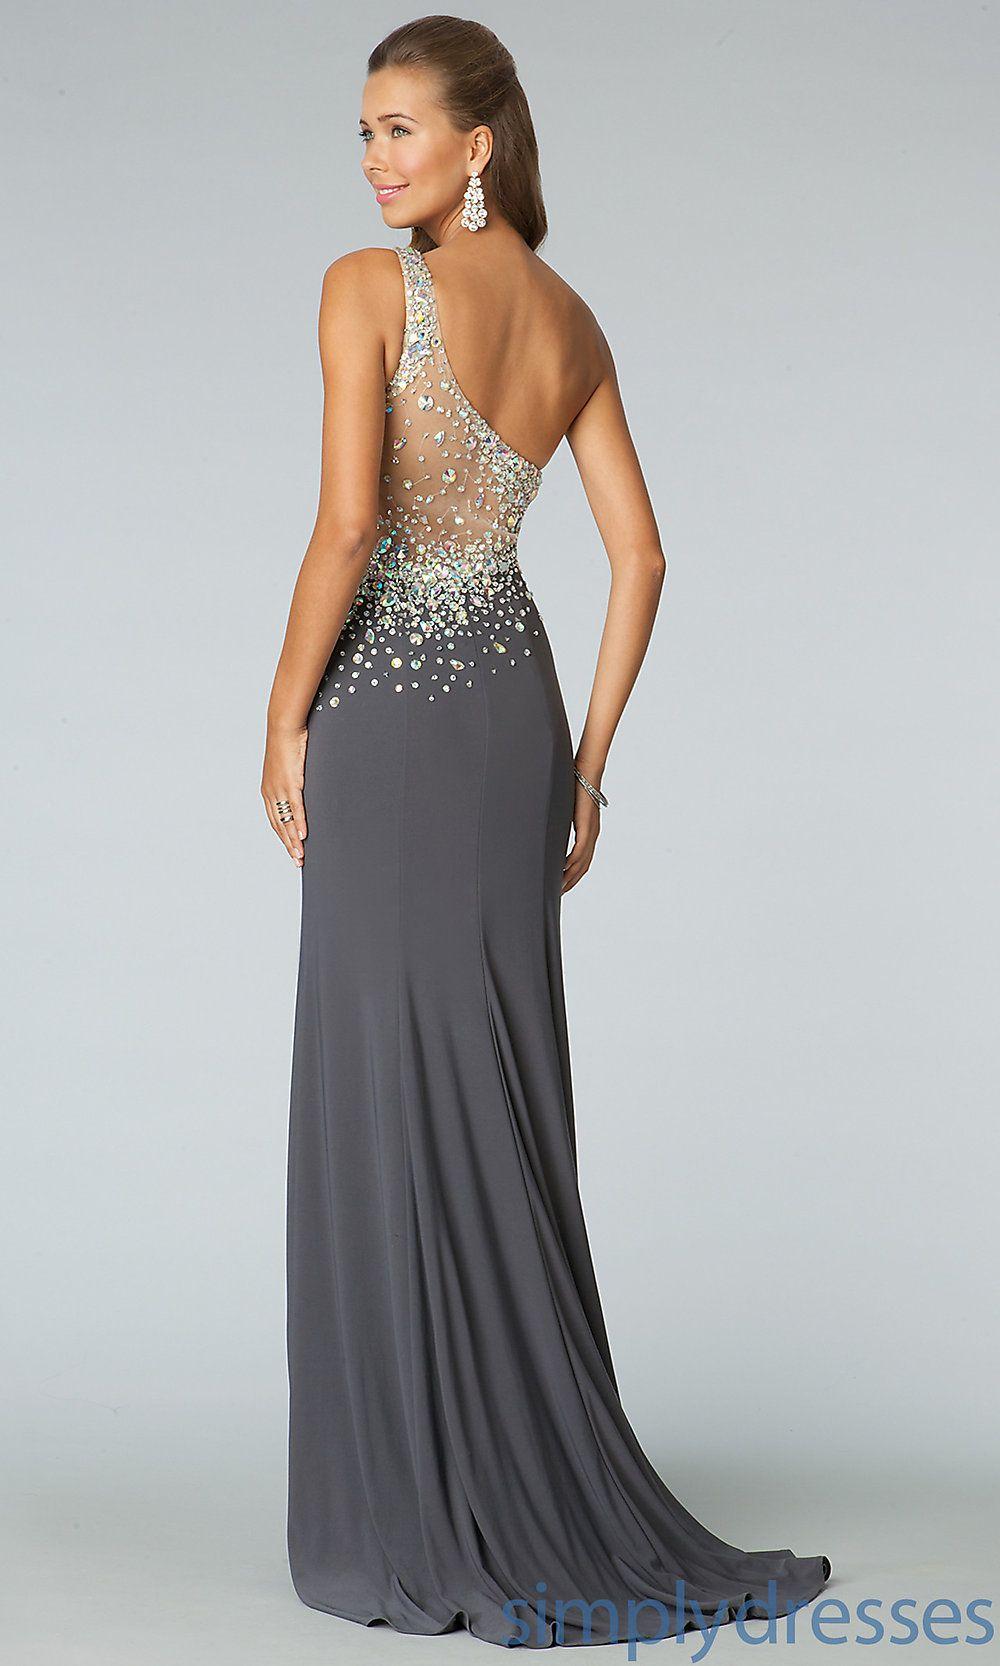 Full Length One Shoulder JVN by Jovani Prom Dress - SimplyDresses ...